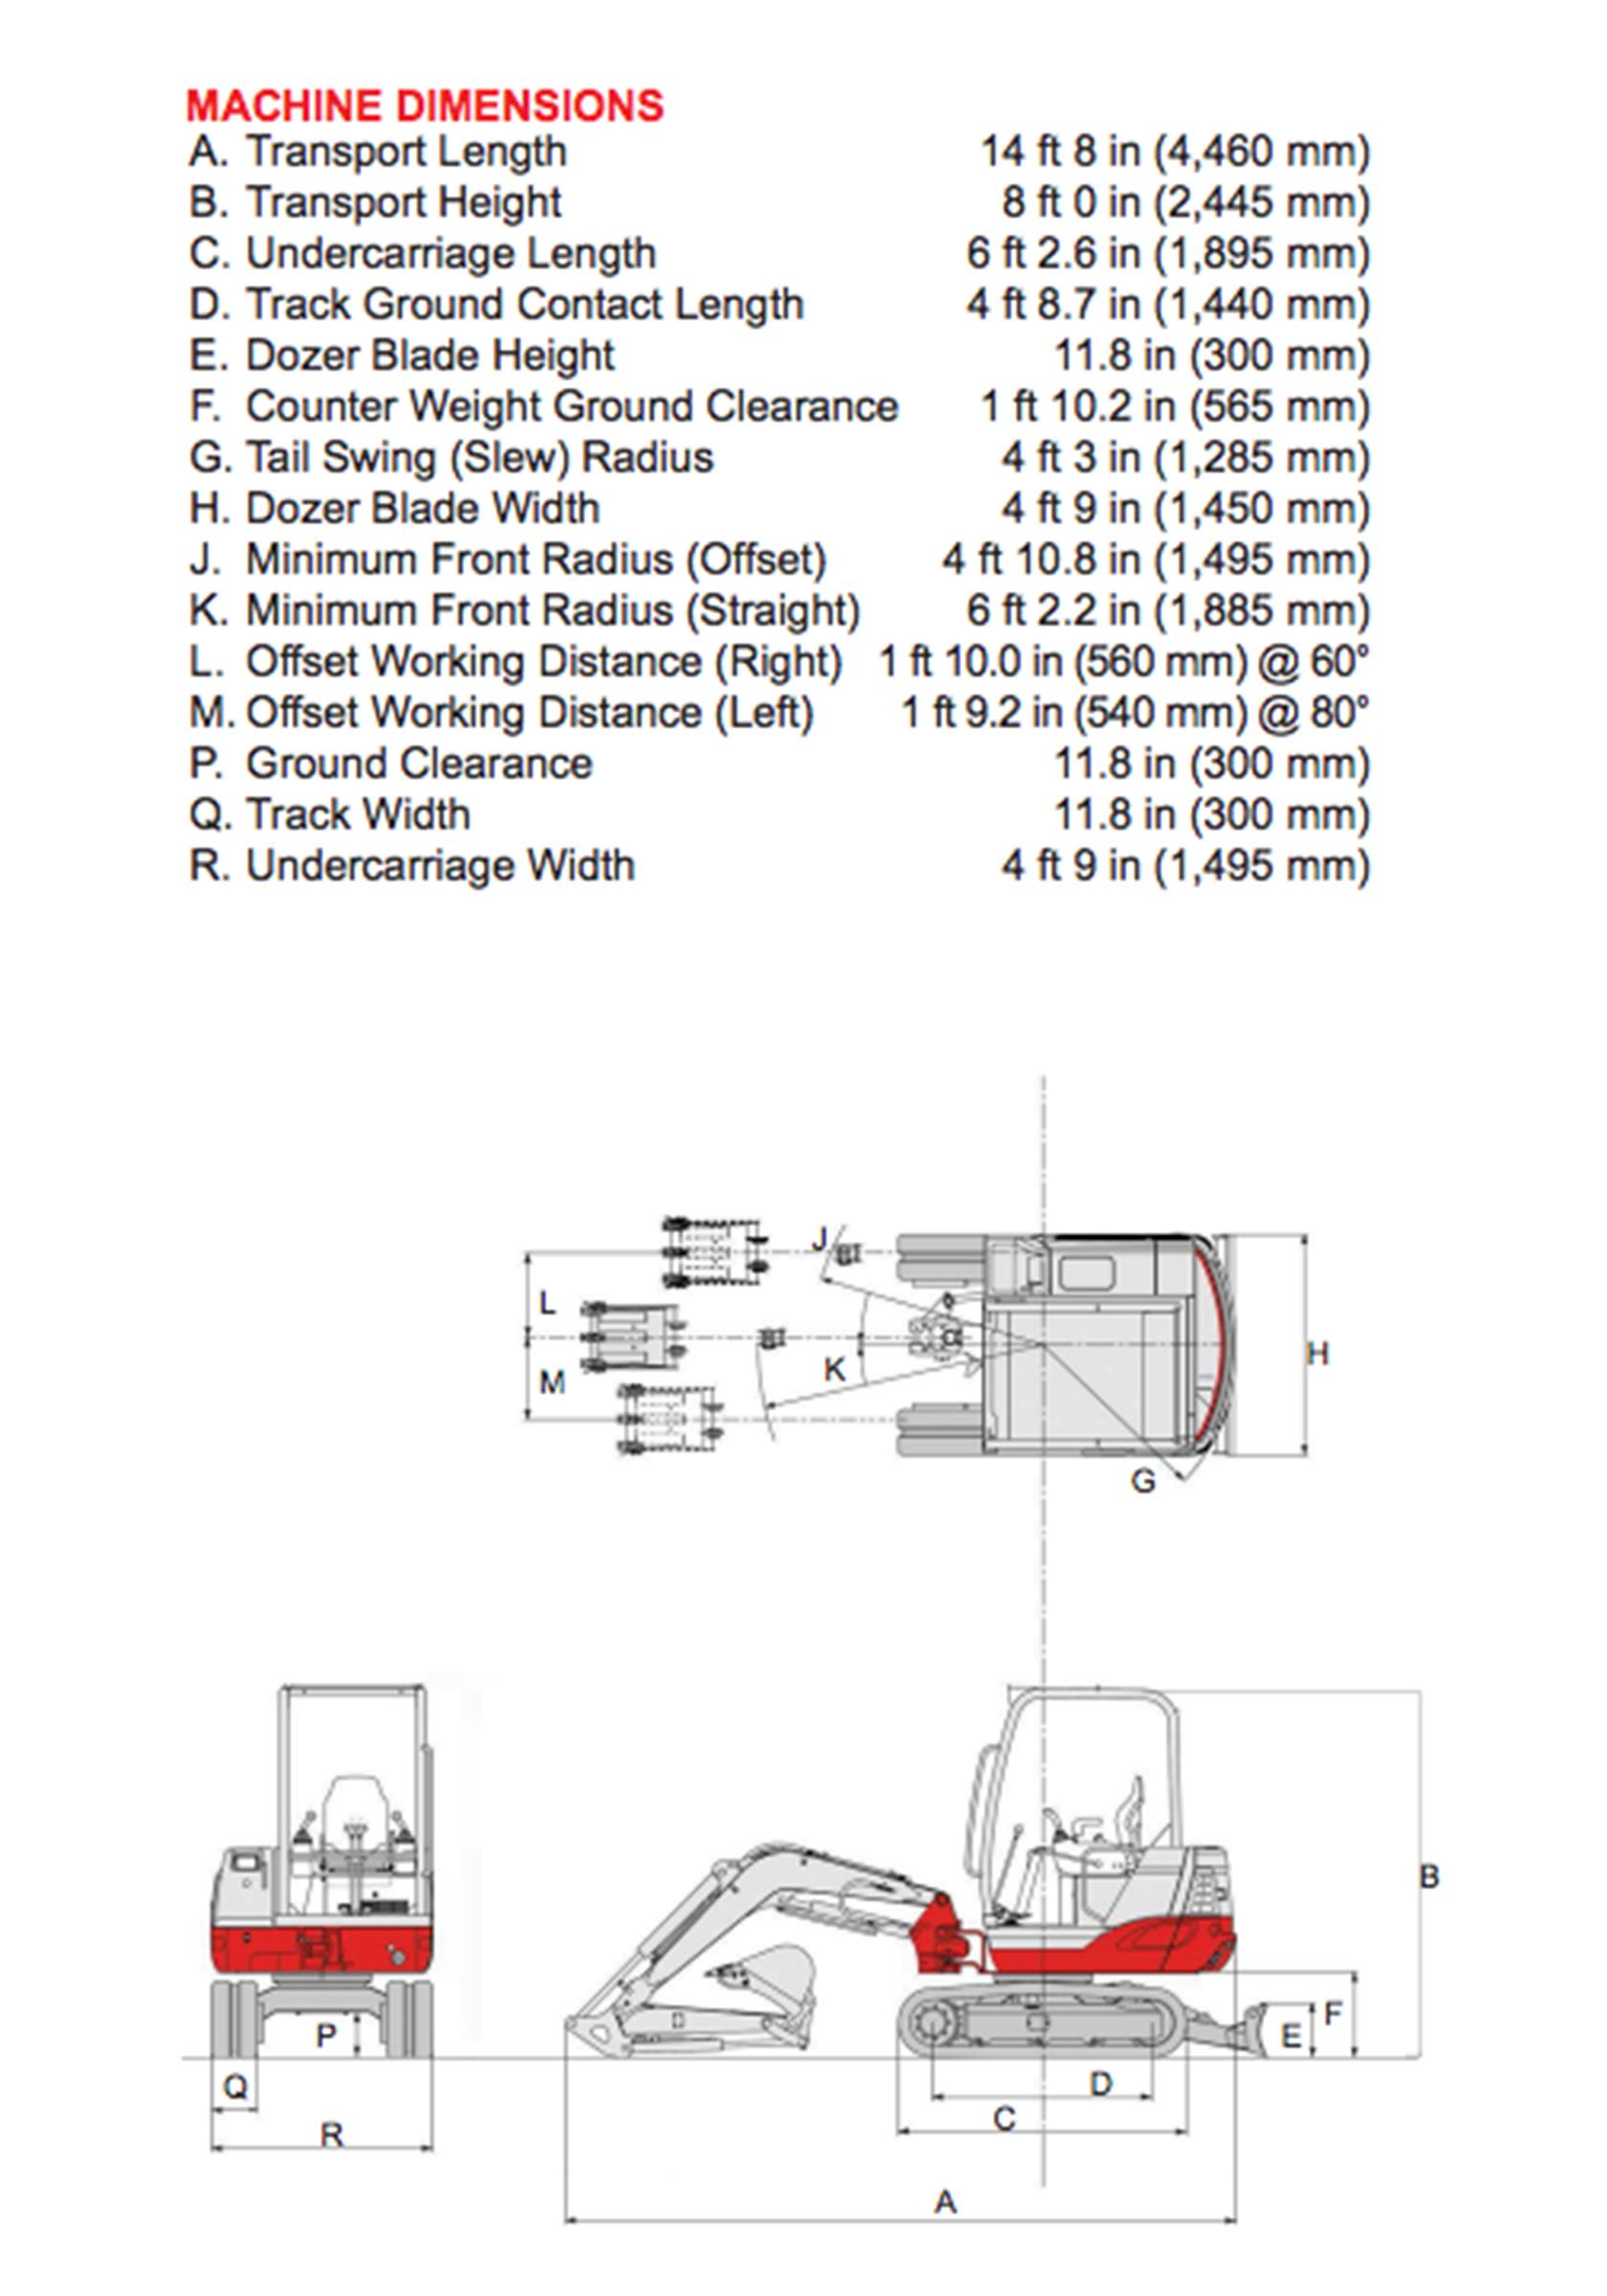 Takeuchi Mini Excavator Rentals at Oconee Rental, Inc